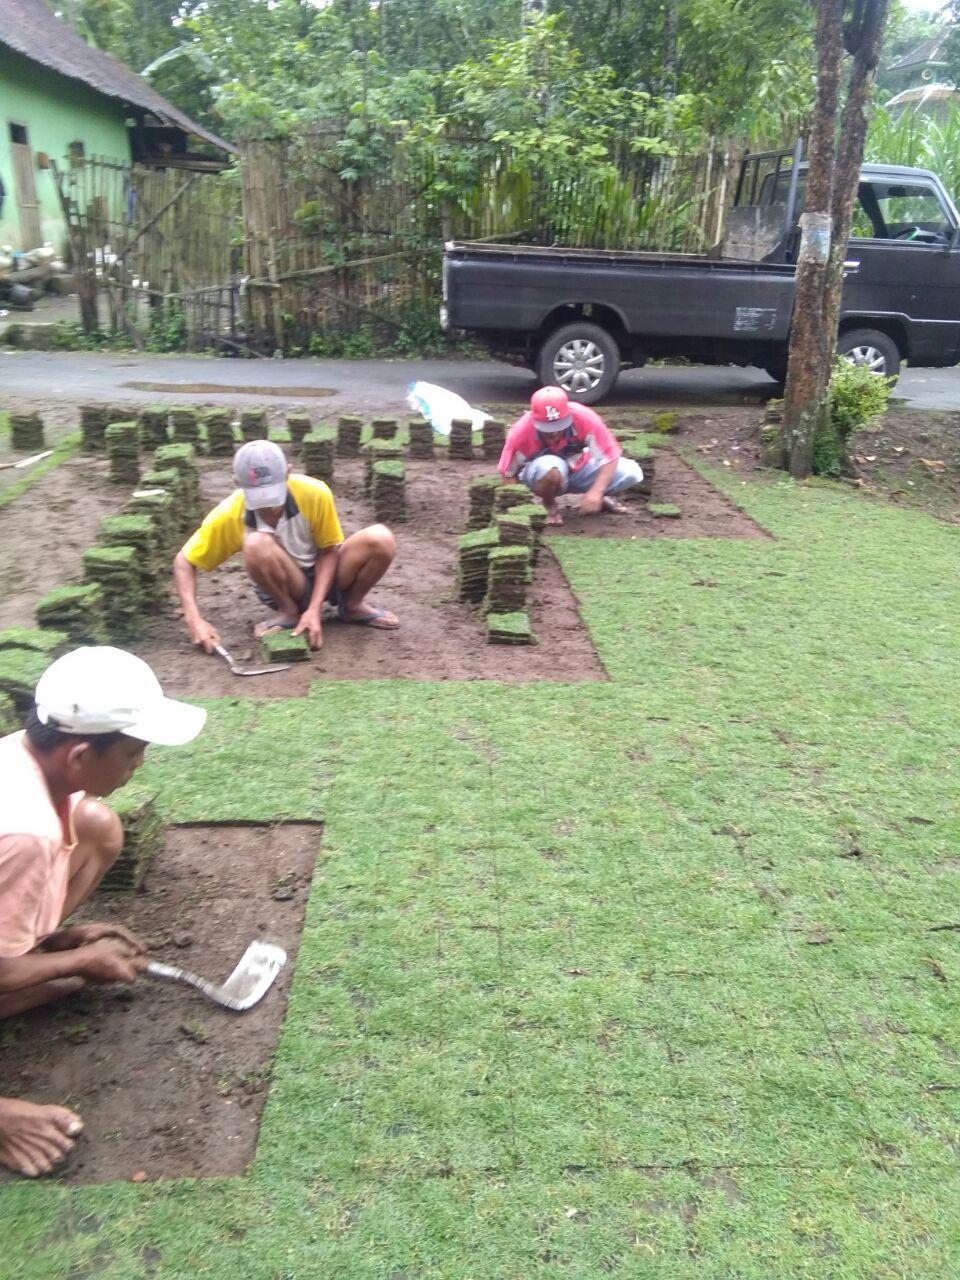 Rumput Jepang Jombang Jatim Untuk Konsumen Penjual Tanaman Hias Biji Suplay Ke Jawa Timur Pesenan Pak Lutfianto Bunga Dibawah Adalah Proses Panen Hingga Dikirim Kios Bunganya